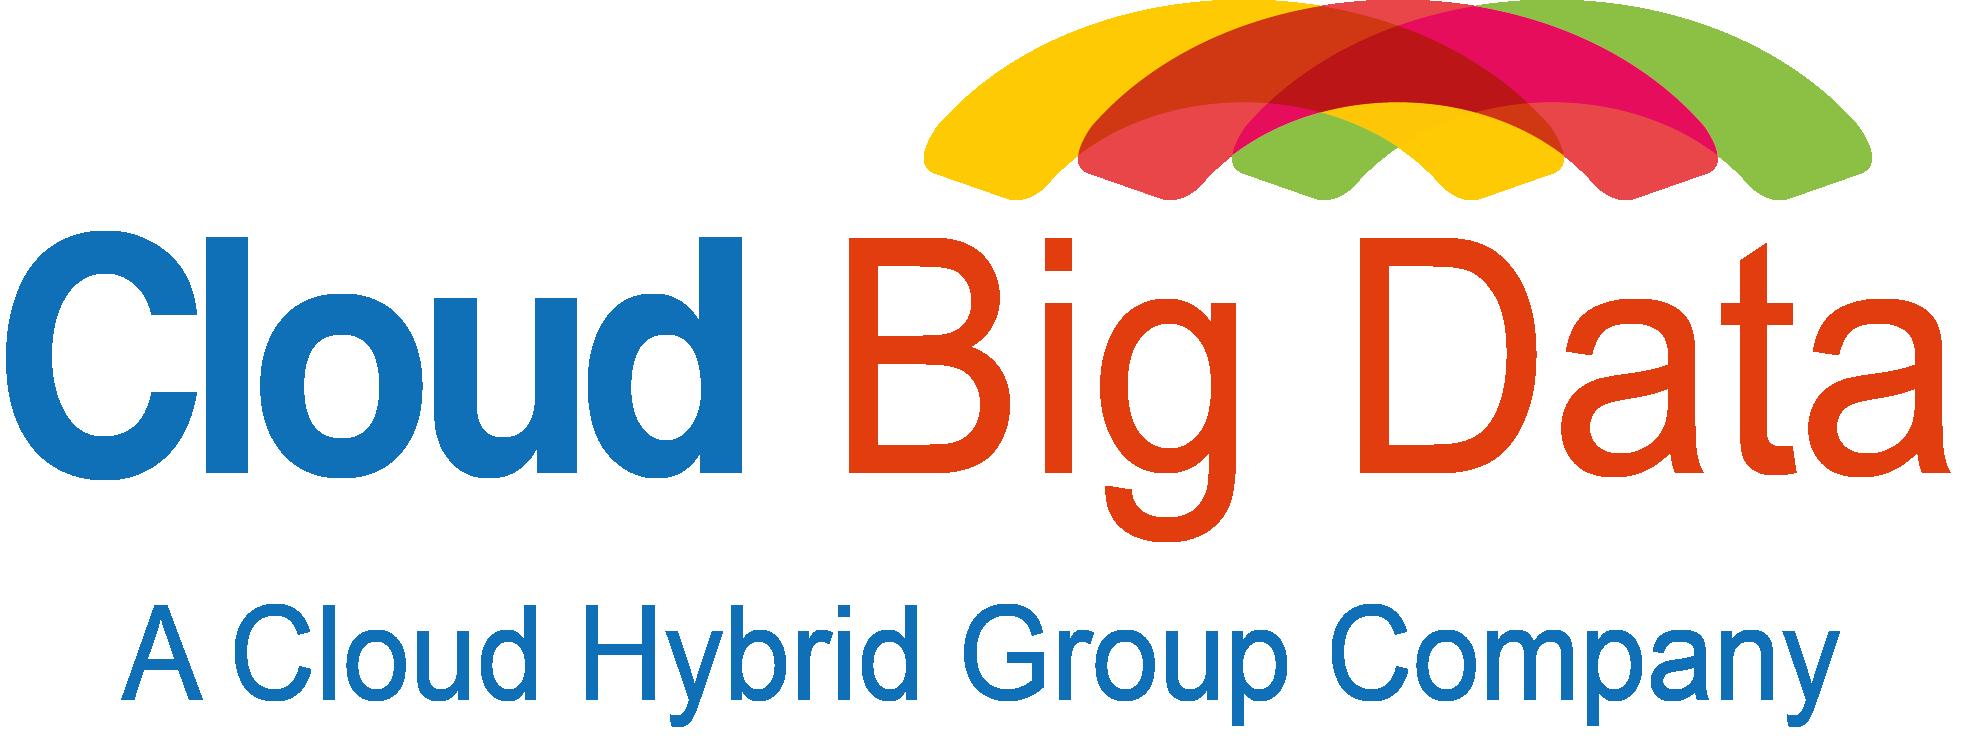 Pin By Cloud Big Data On Cloud Big Data Technologies Big Data Technologies Staffing Agency Talent Management